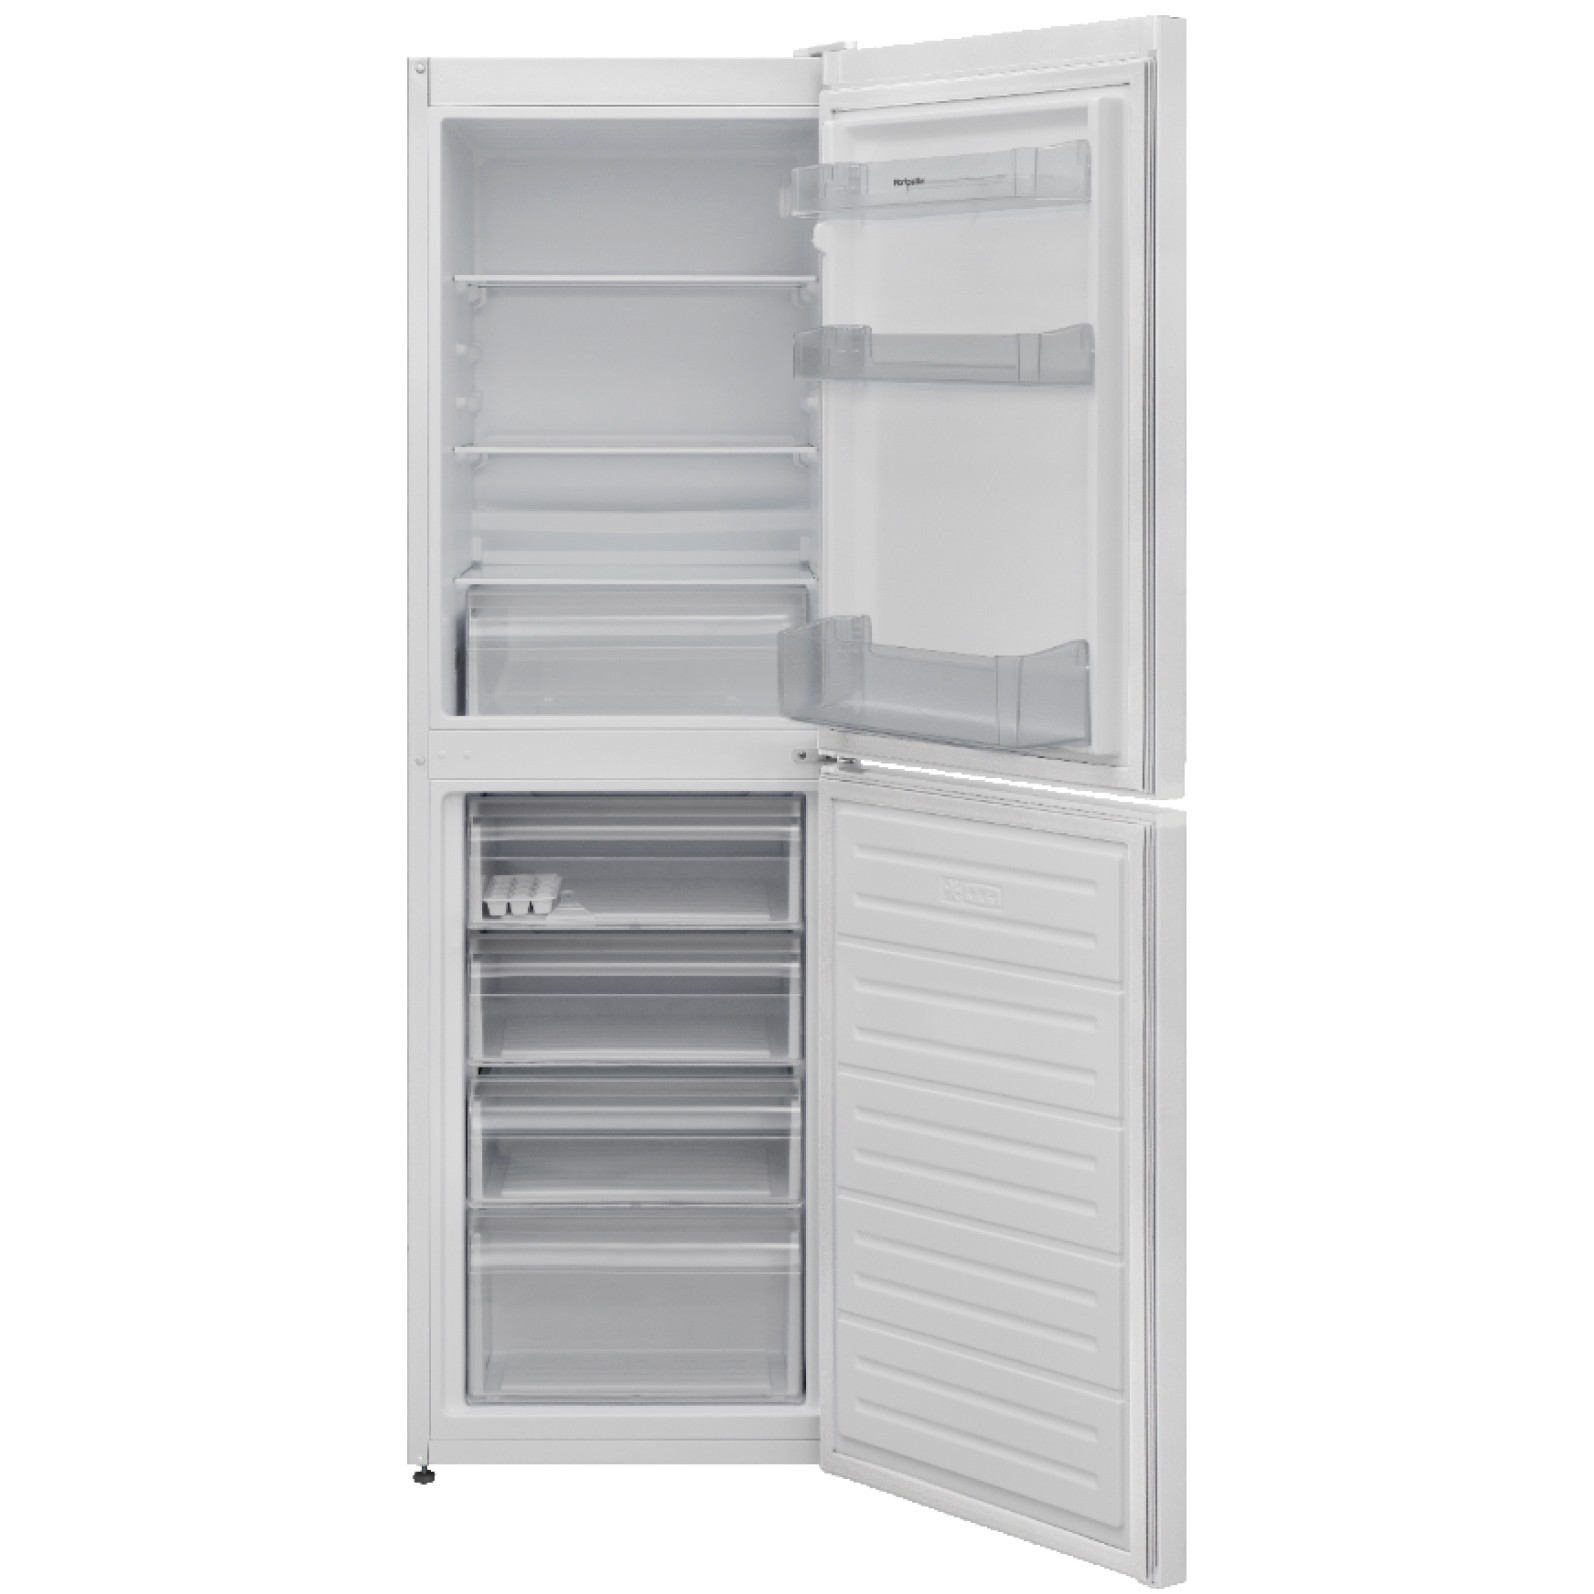 Montpellier MS166W Fridge Freezer